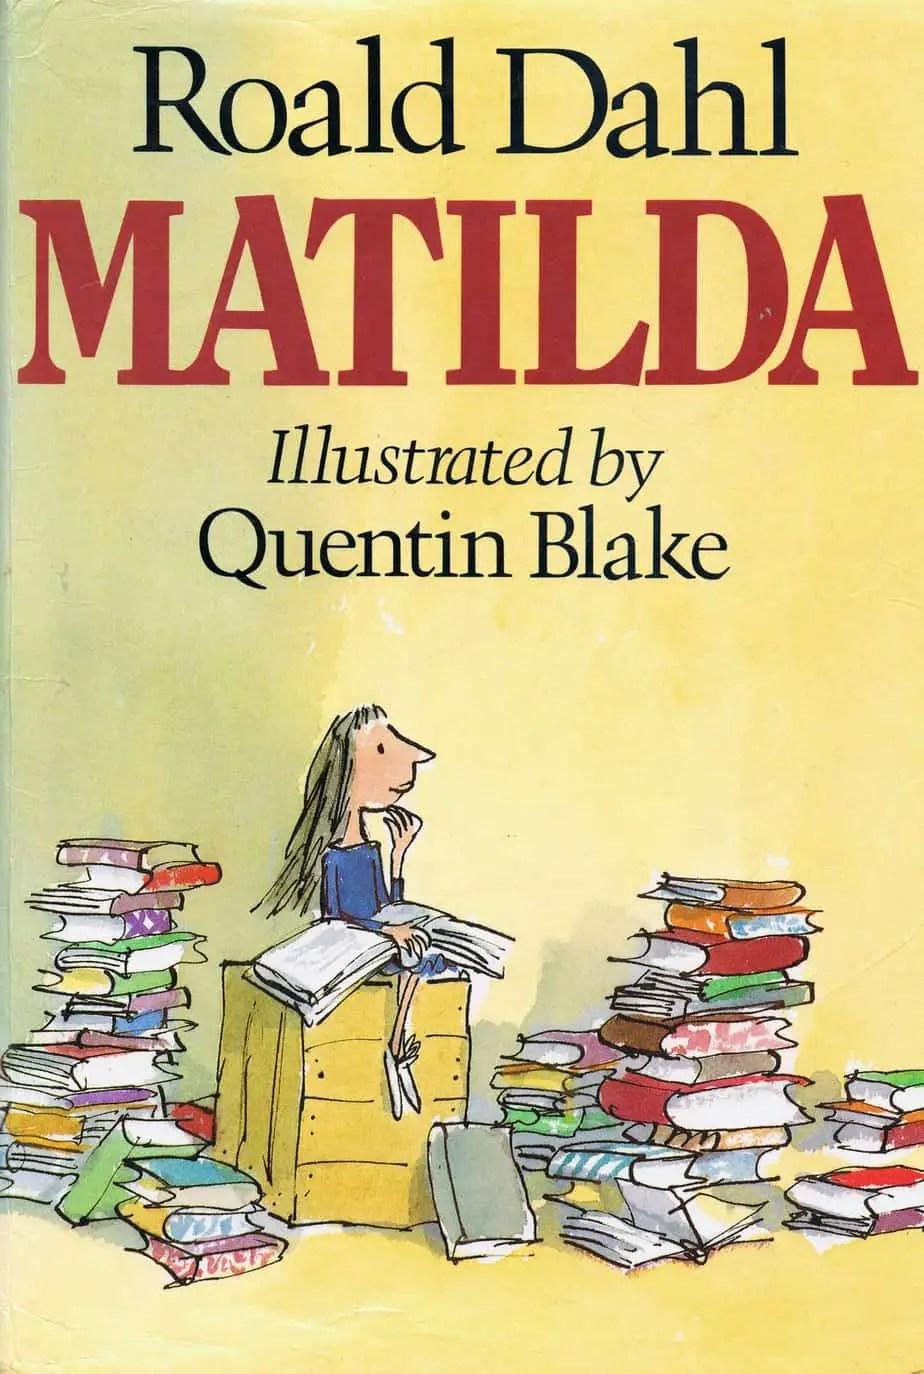 Matilda by roald dahl novel study slap happy larry fandeluxe Choice Image